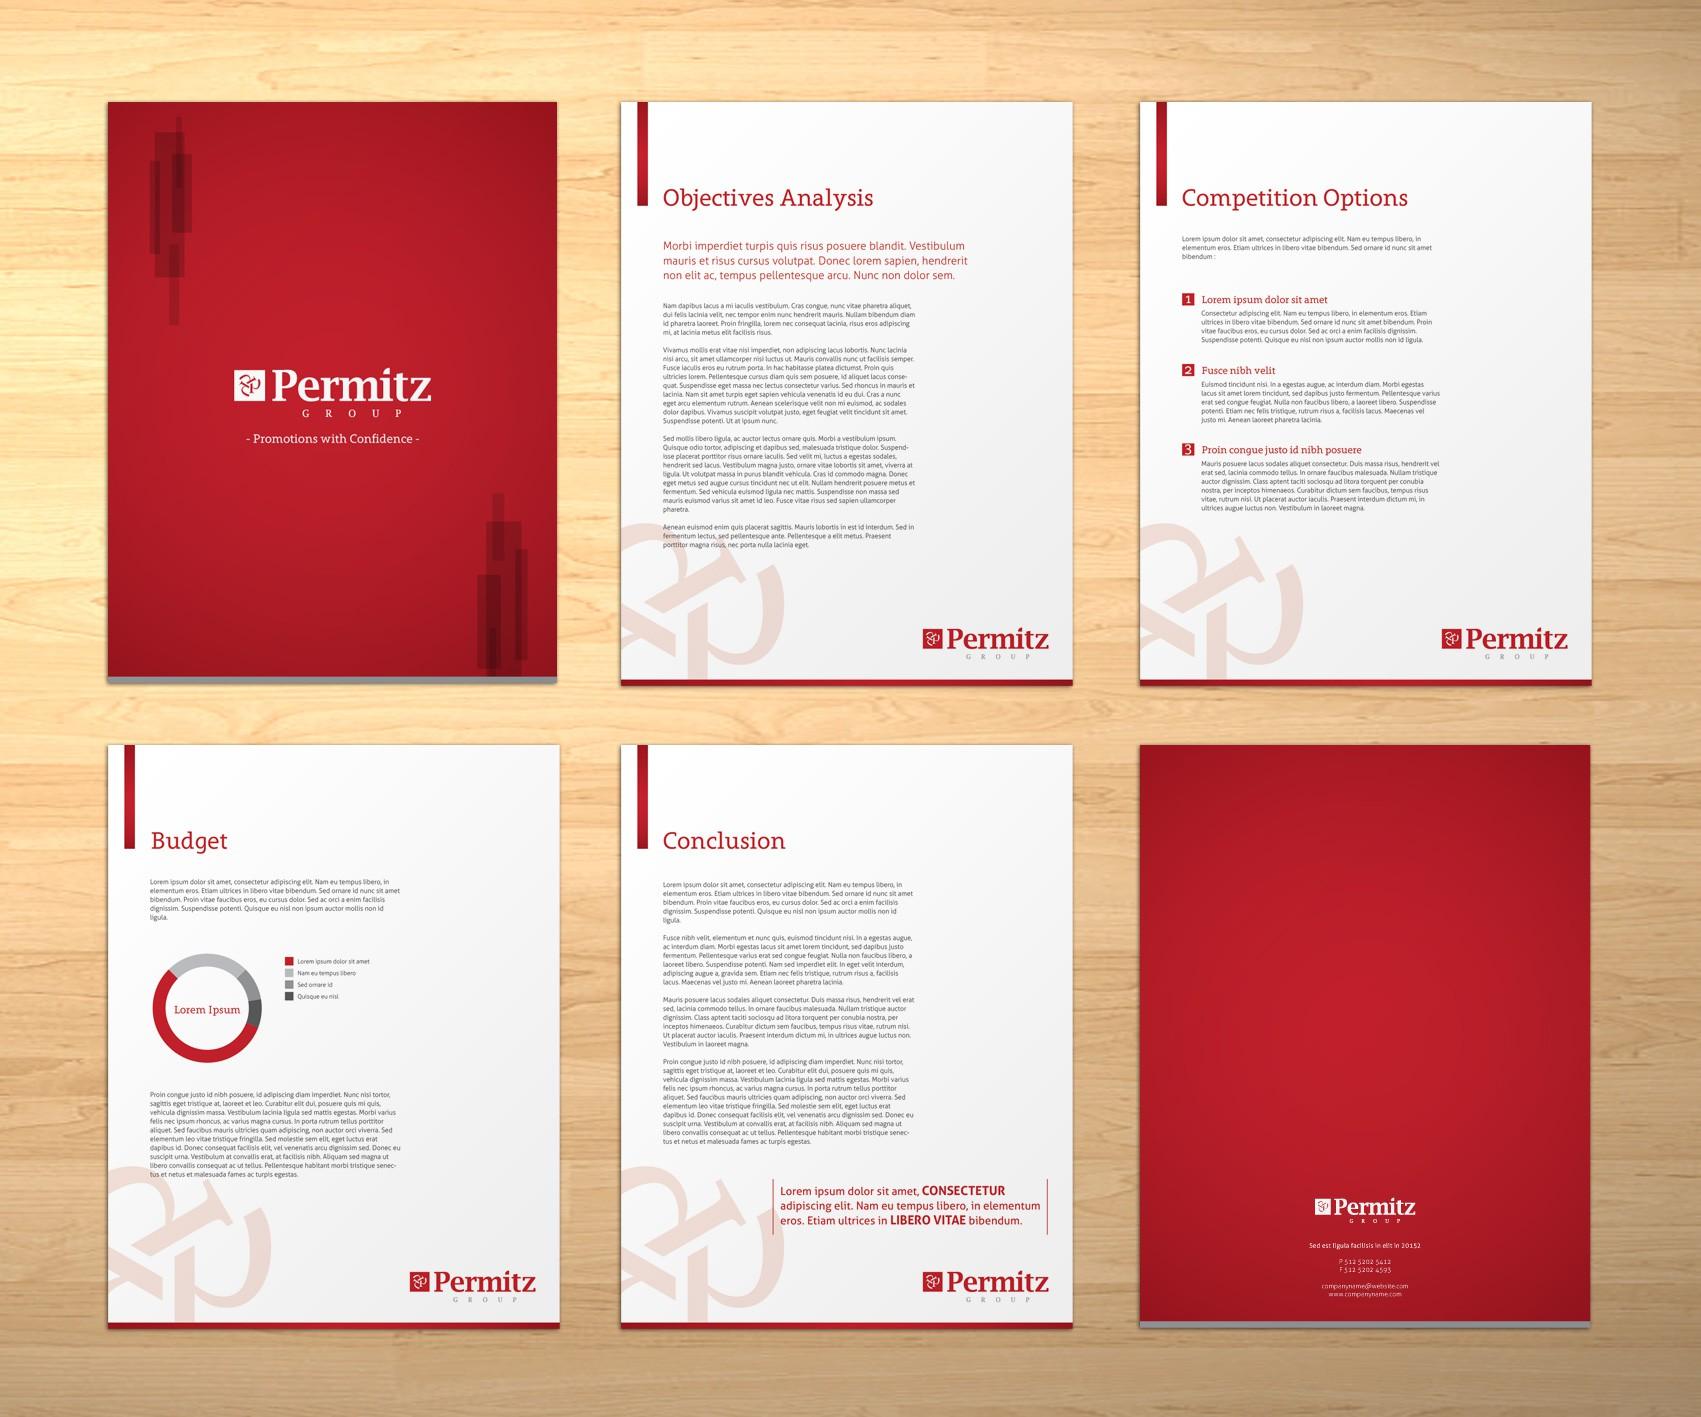 Create the next brochure design for www.permitzgroup.com.au